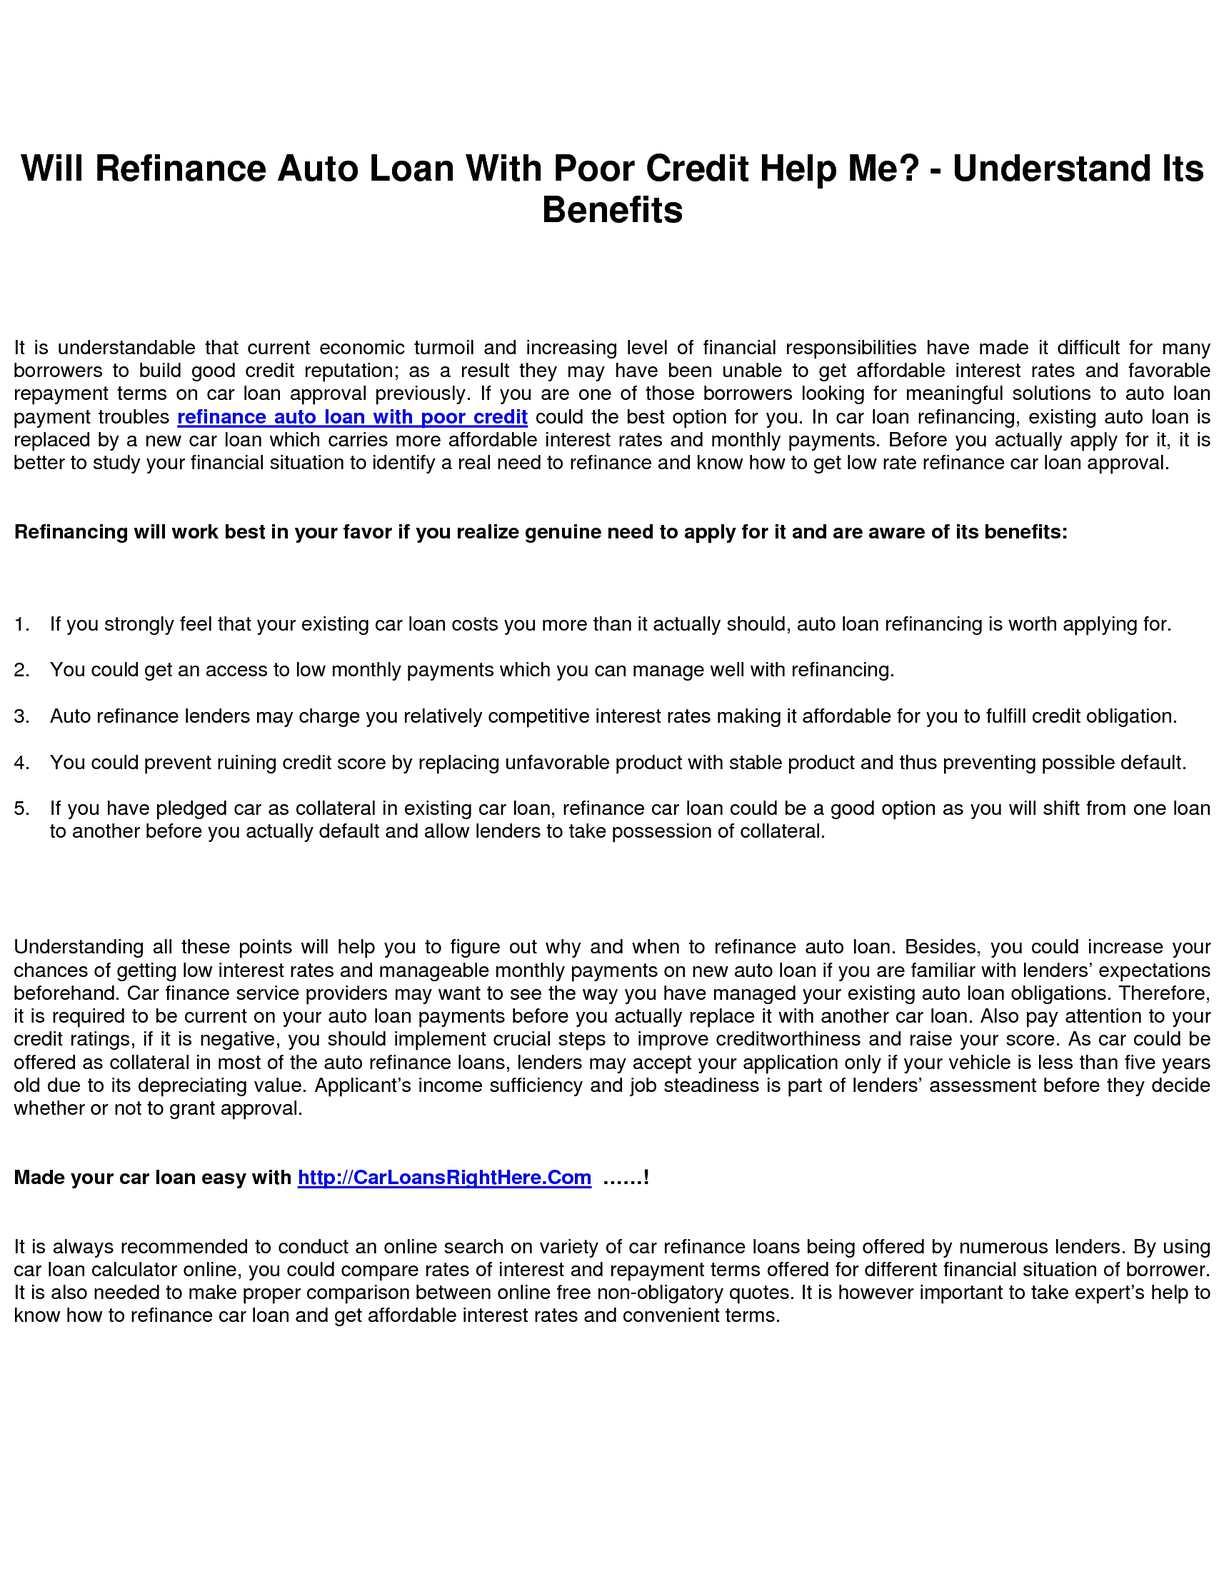 Refinance Car Loan With Bad Credit >> Calameo Refinance Auto Loan With Poor Credit